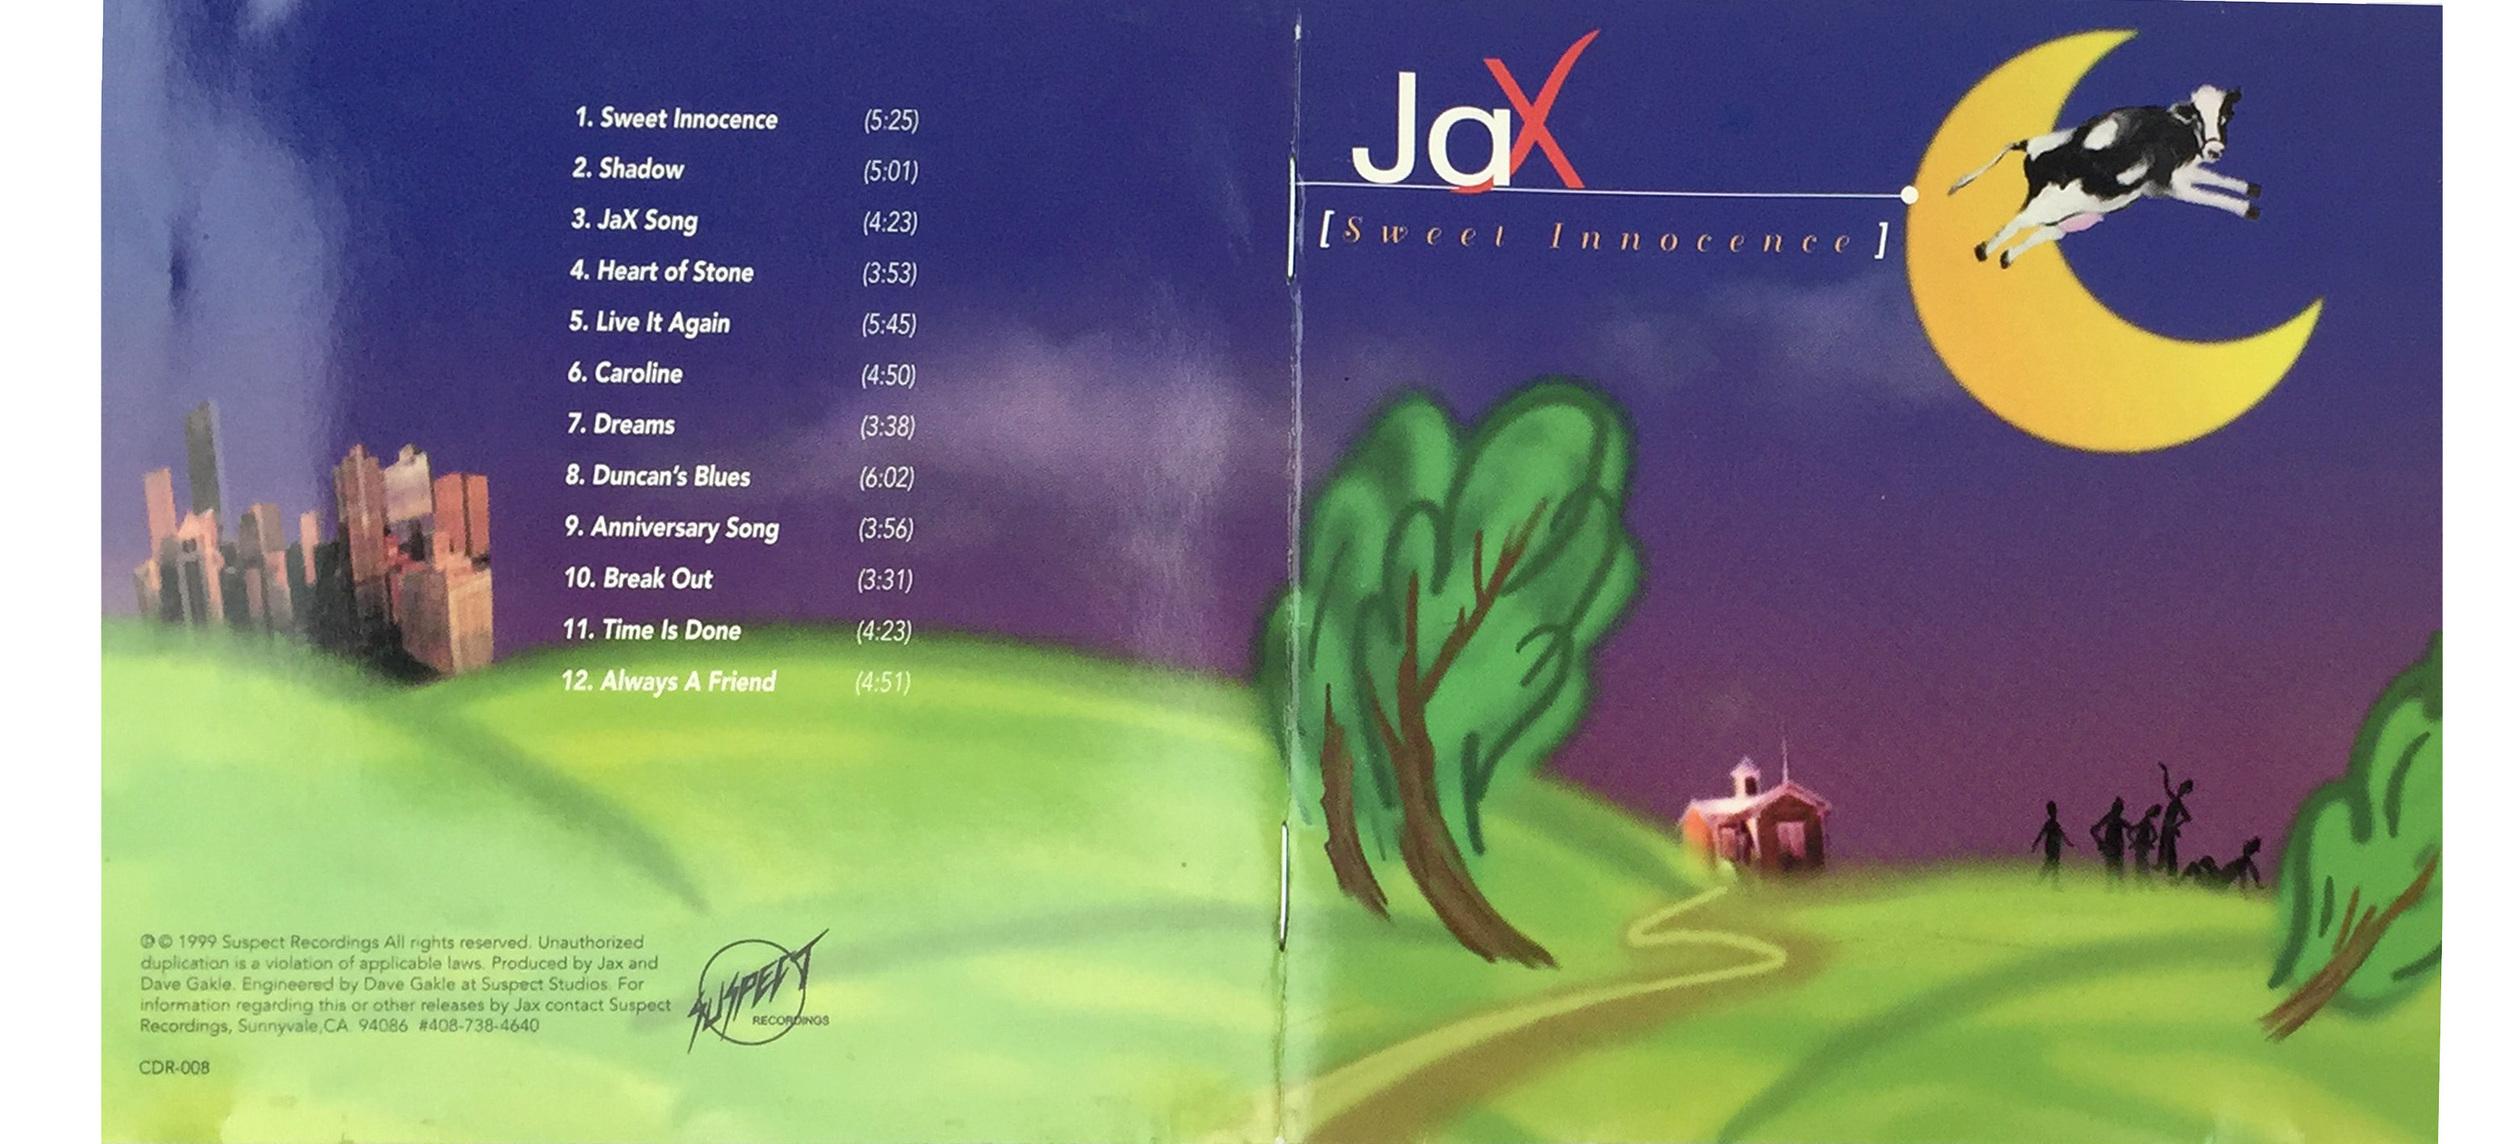 Jax cd cover.jpg